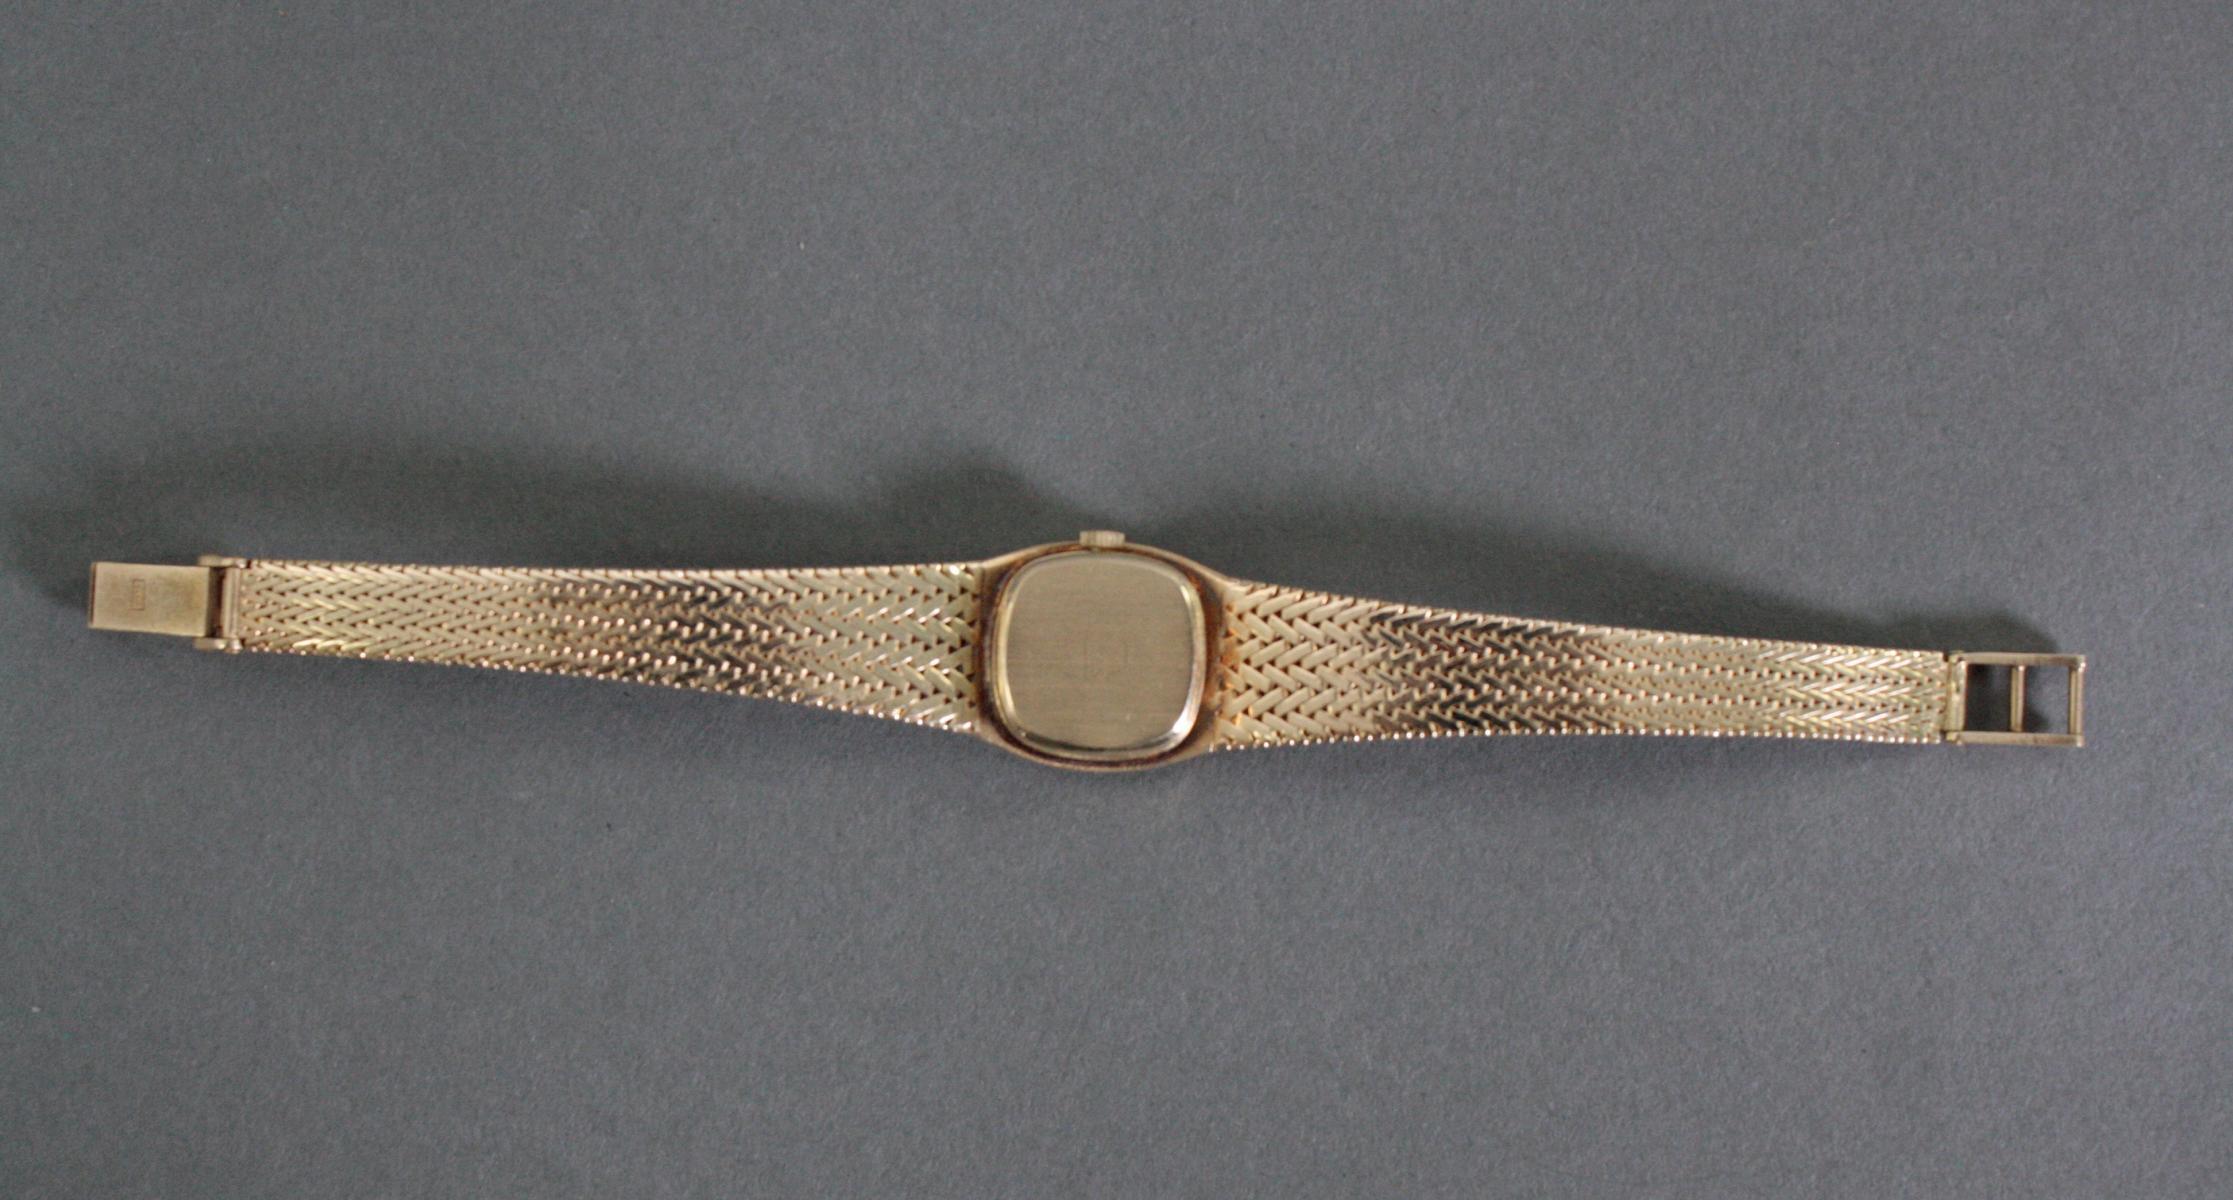 Favor Damenarmbanduhr, 14 Karat Gelbgold-2